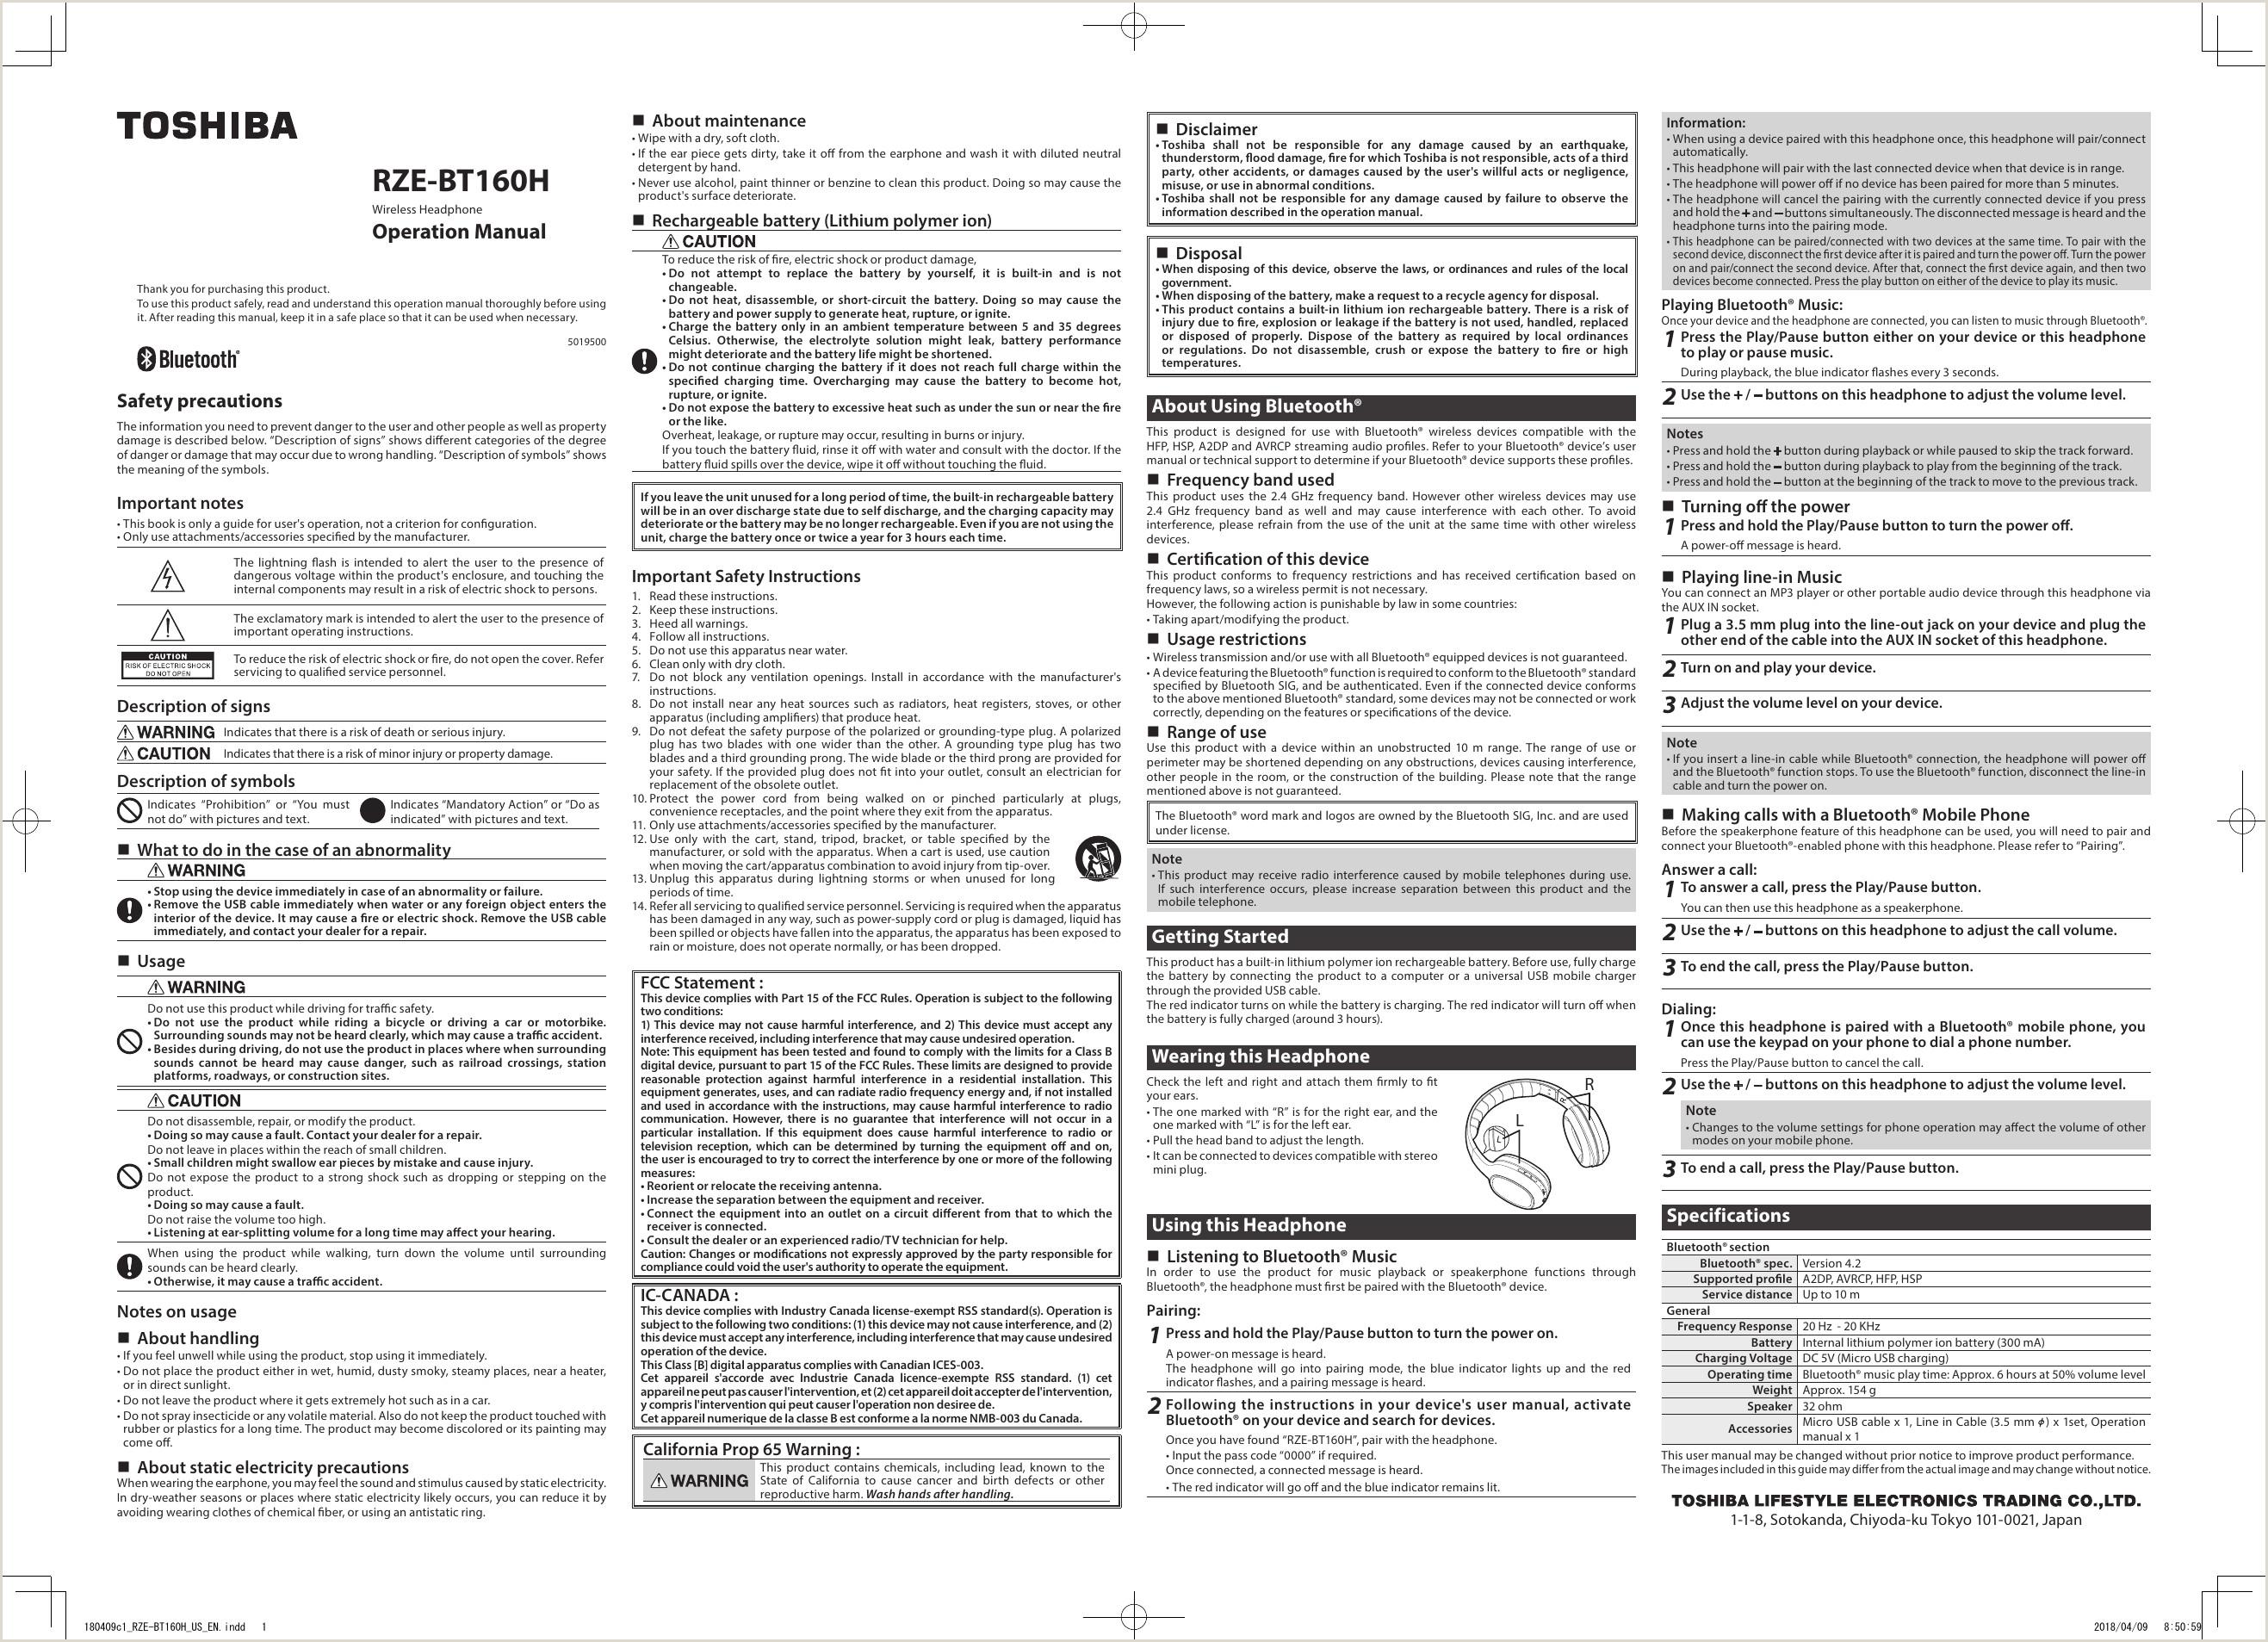 BT160H Bluetooth Earphone User Manual c1 RZE